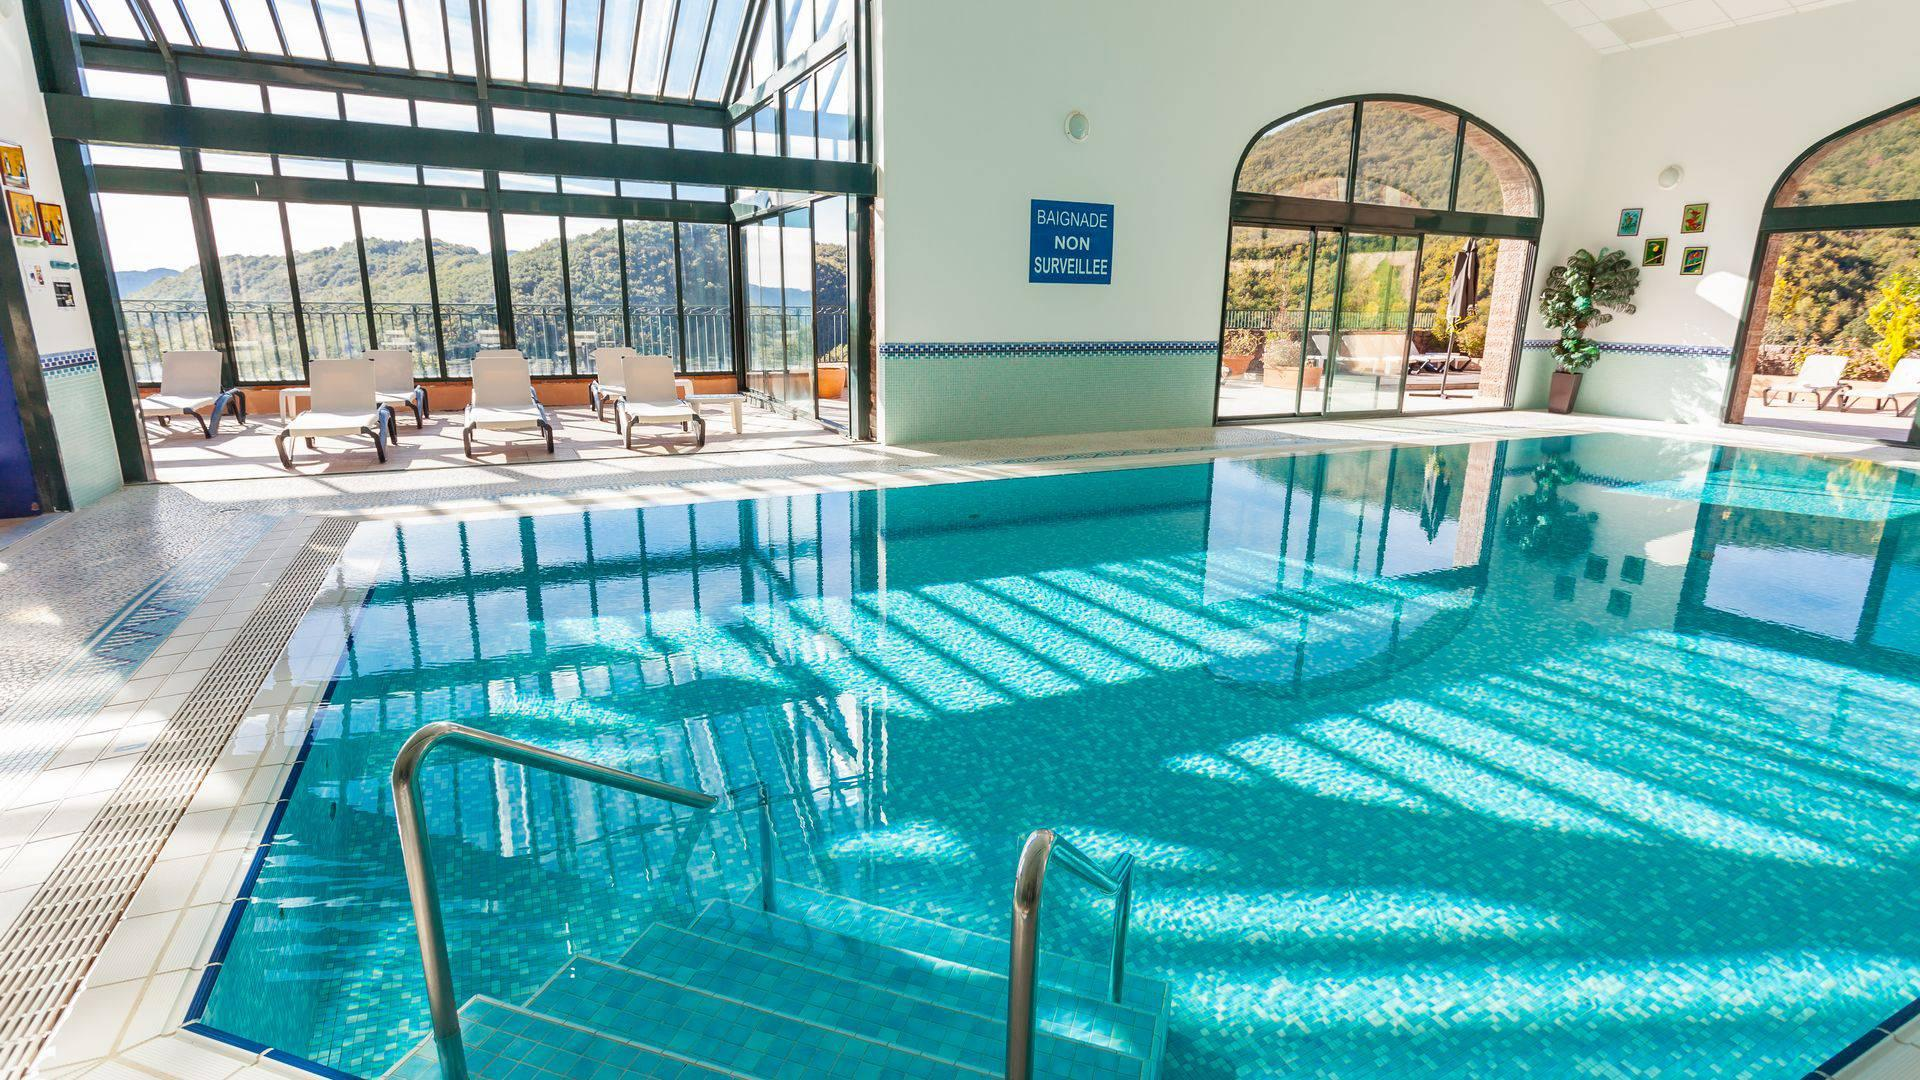 Le-Domaine-de-Falgos-Golf-Spa-occitanie-piscine-seminaires-de-caractere